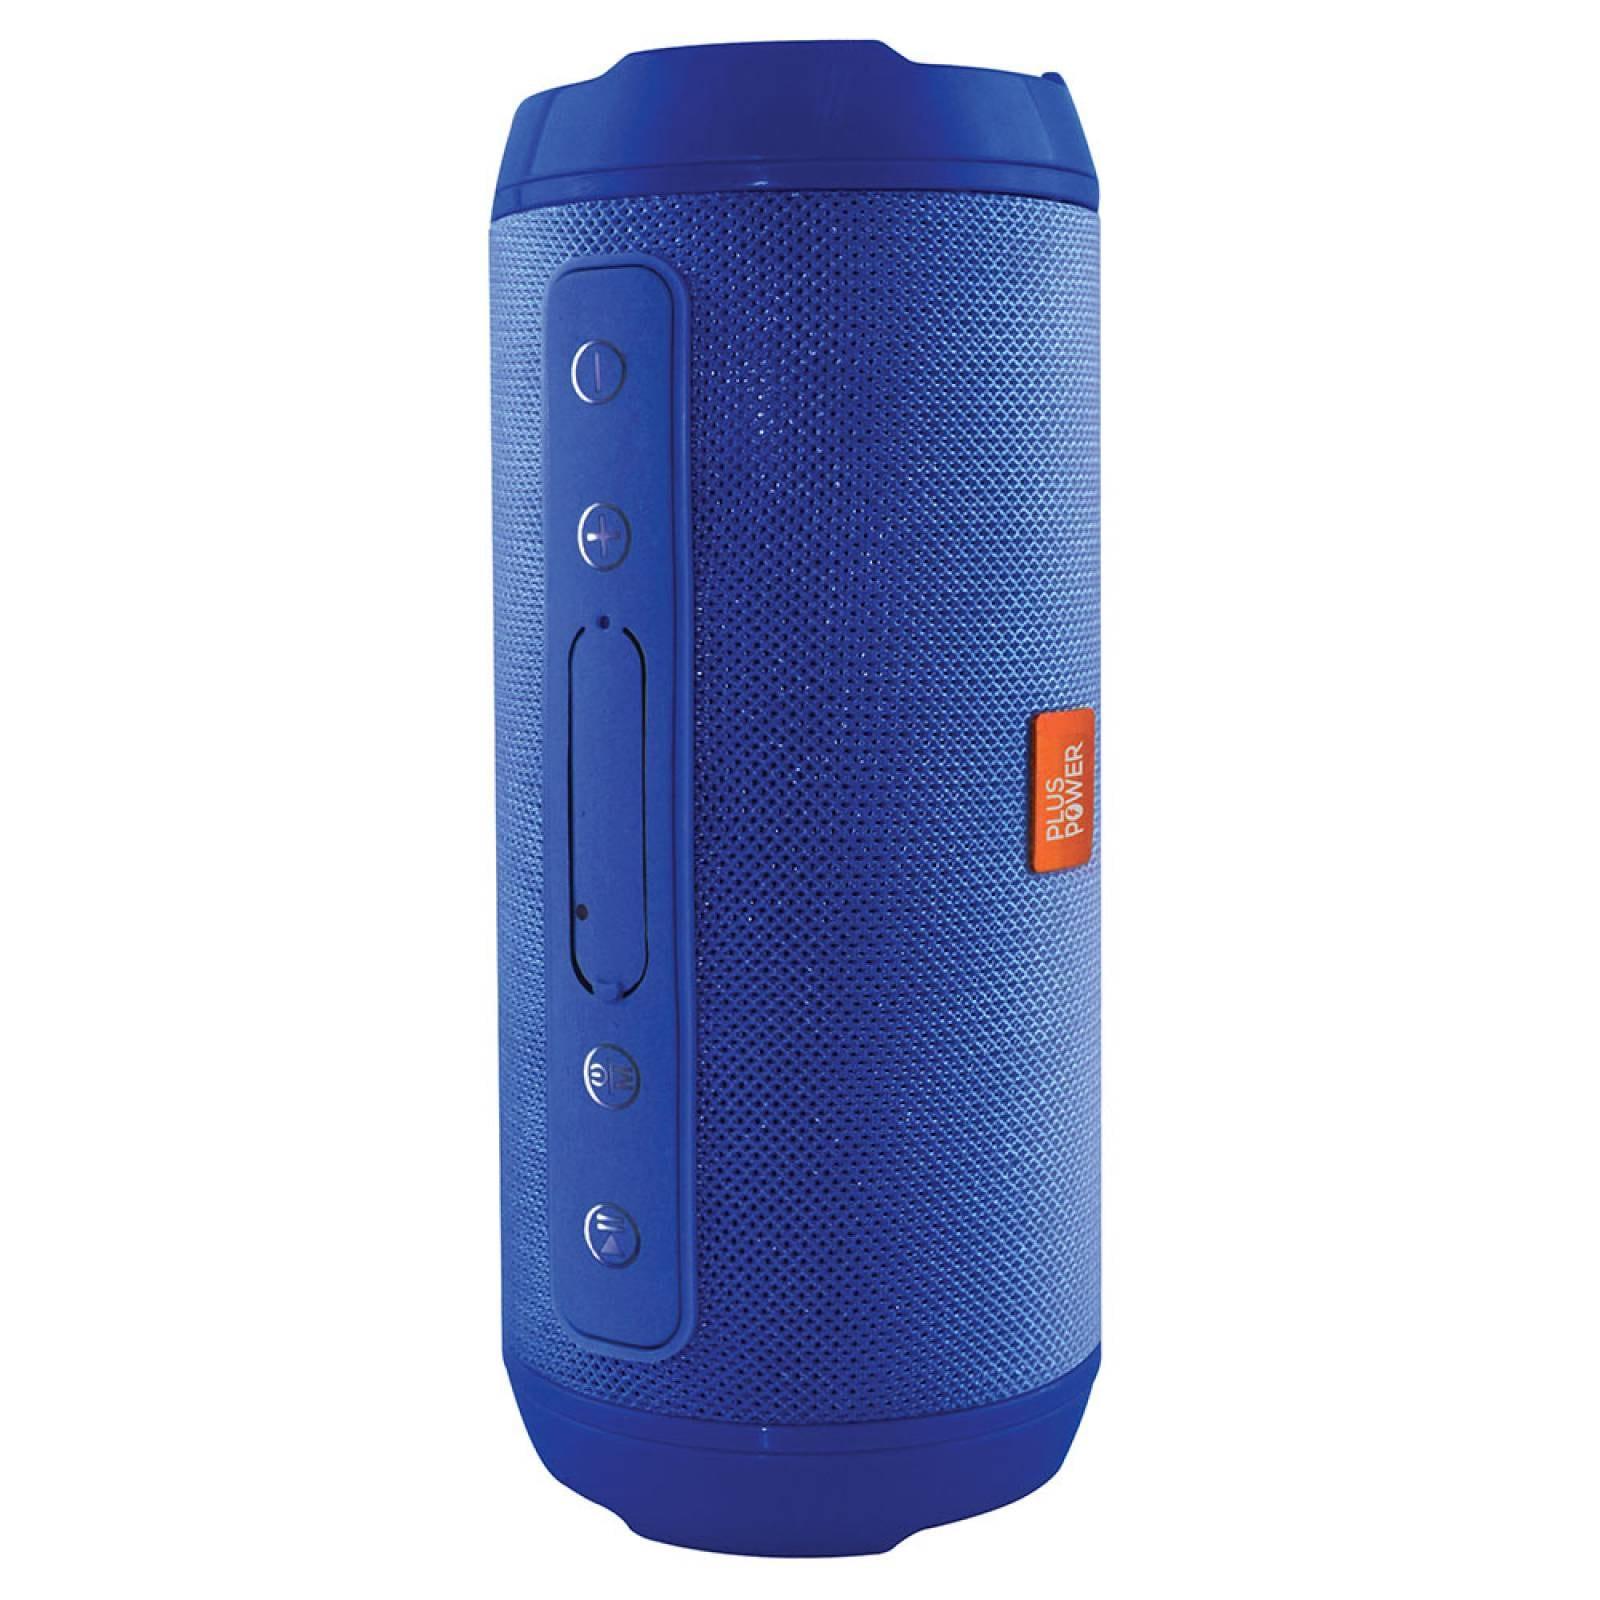 Bocina Bluetooth Portatil Extra Bass Plus Power Sbt107 azul